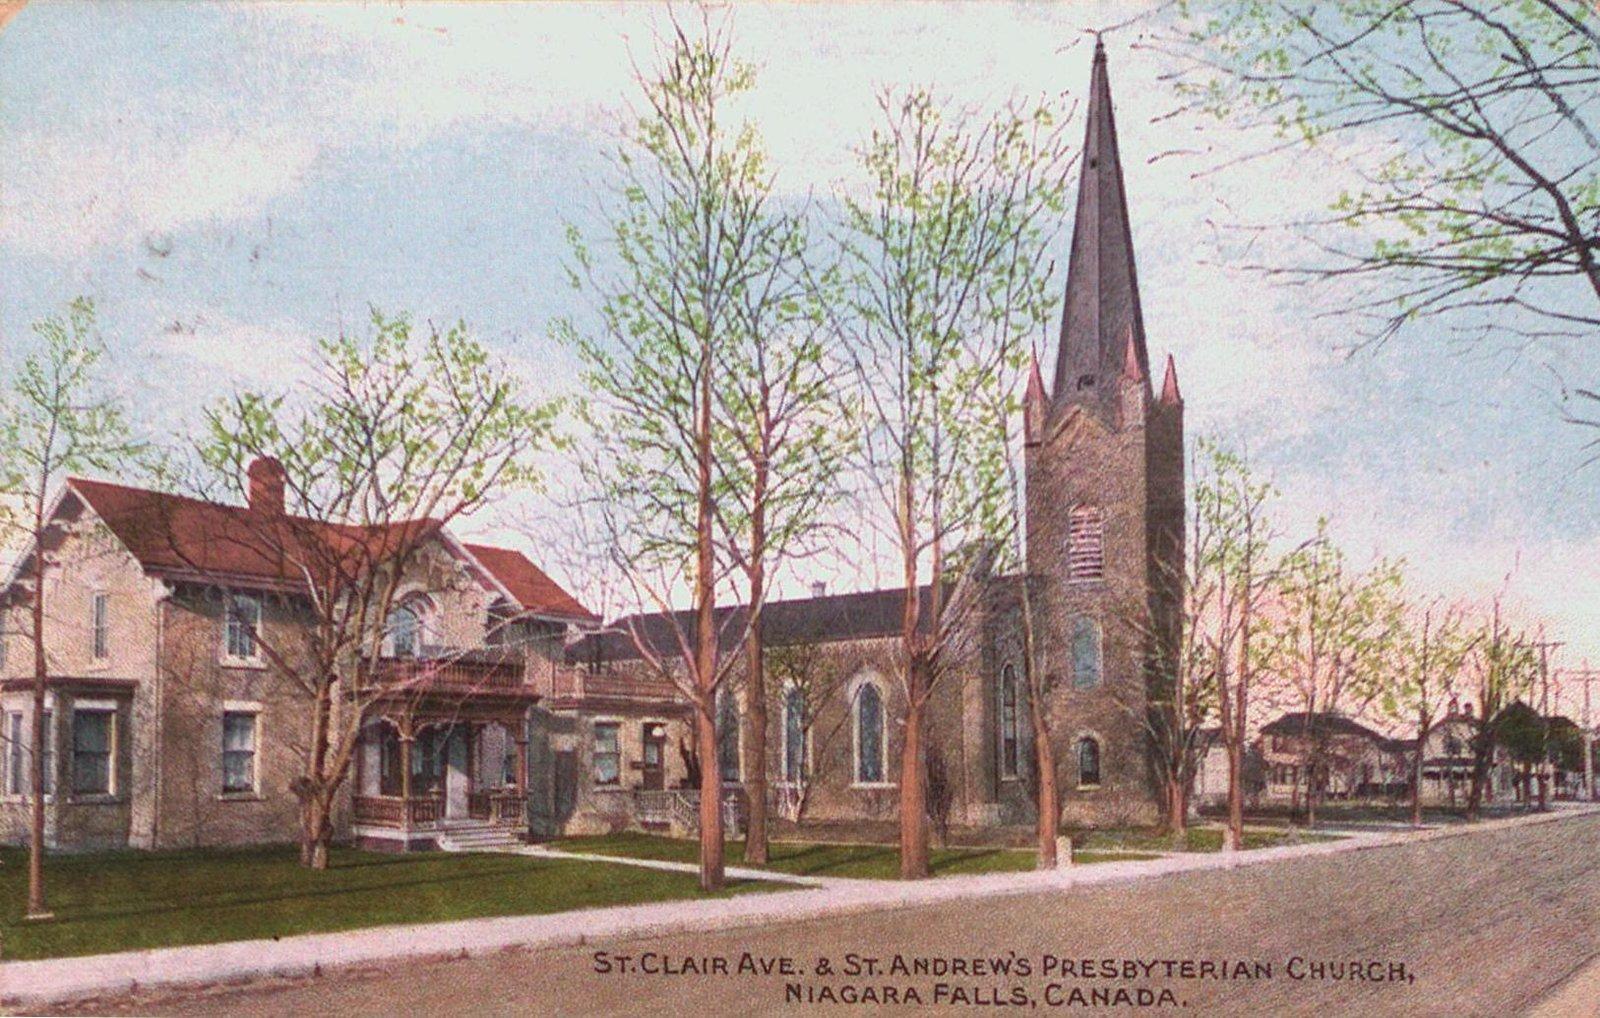 St. Clair Avenue & St. Andrew's Presbyterian Church, Niagara Falls